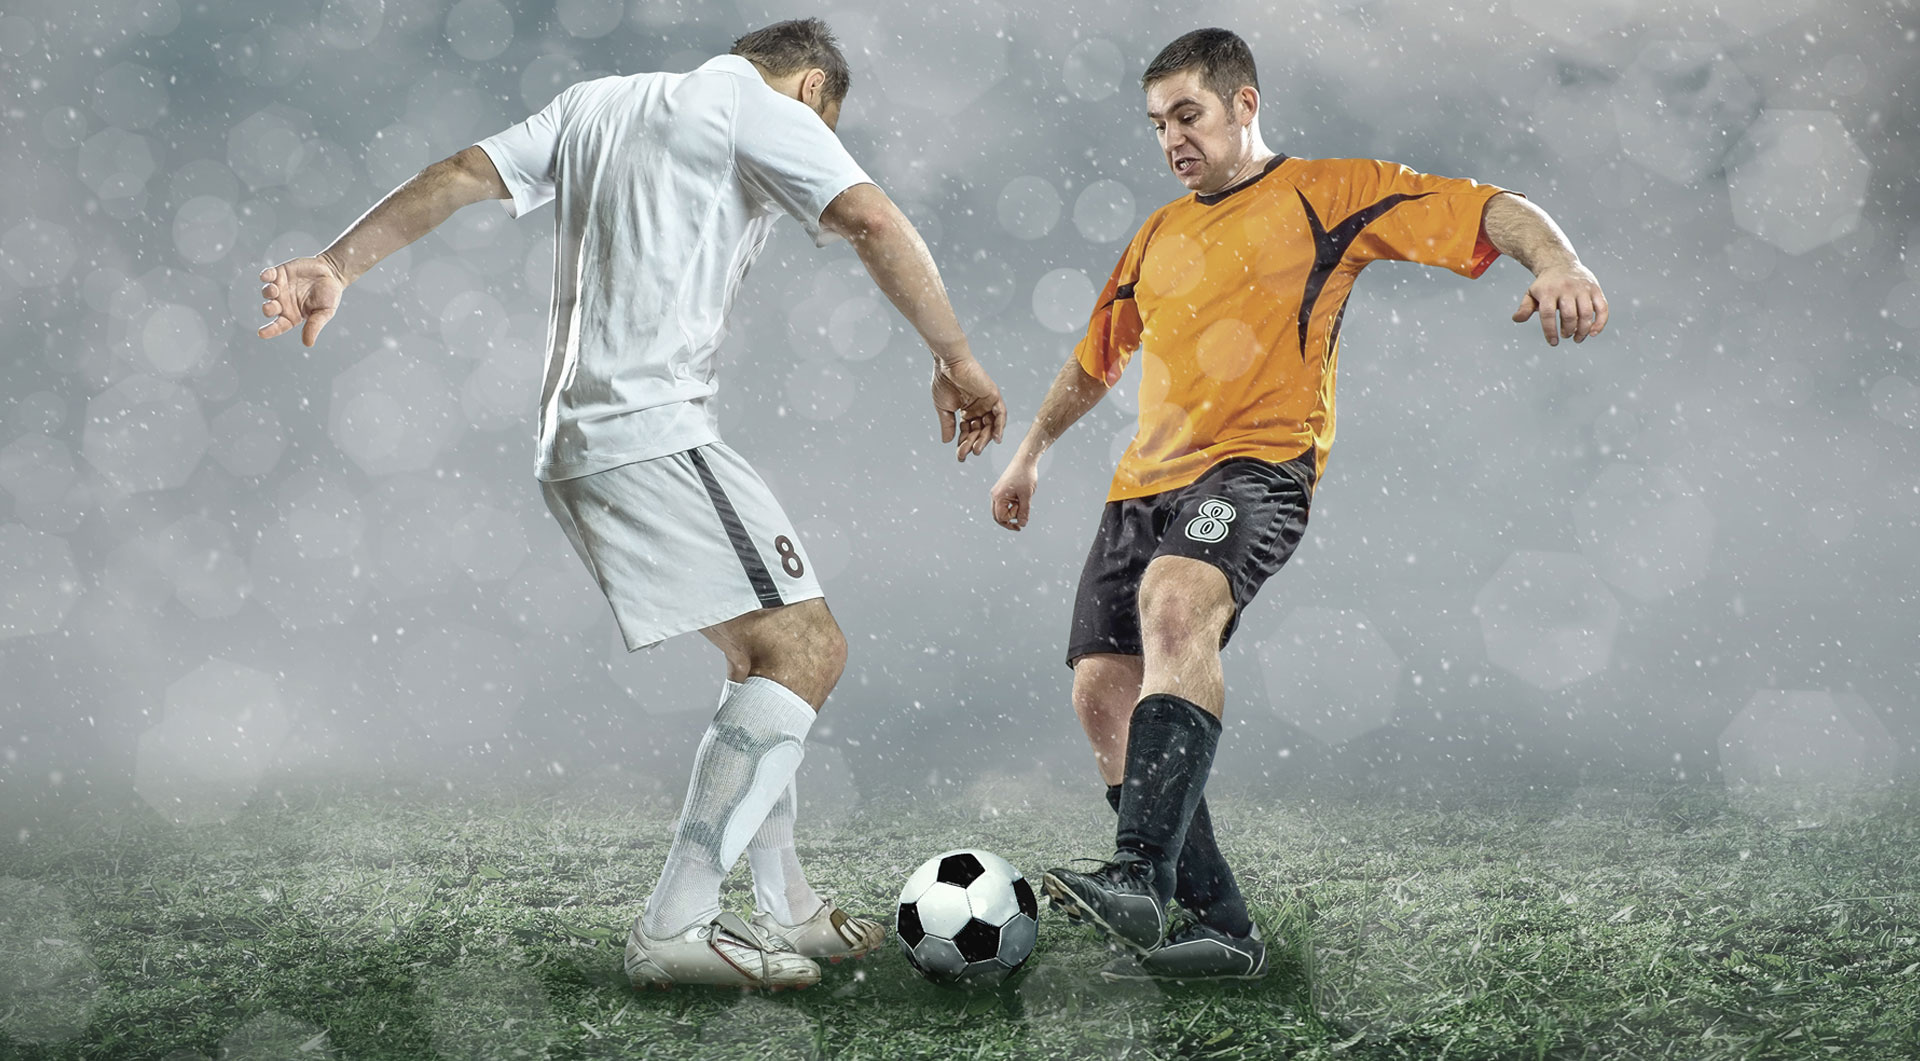 watch-ferrer-vs-krajinovic-us-open-2015-round-2-online